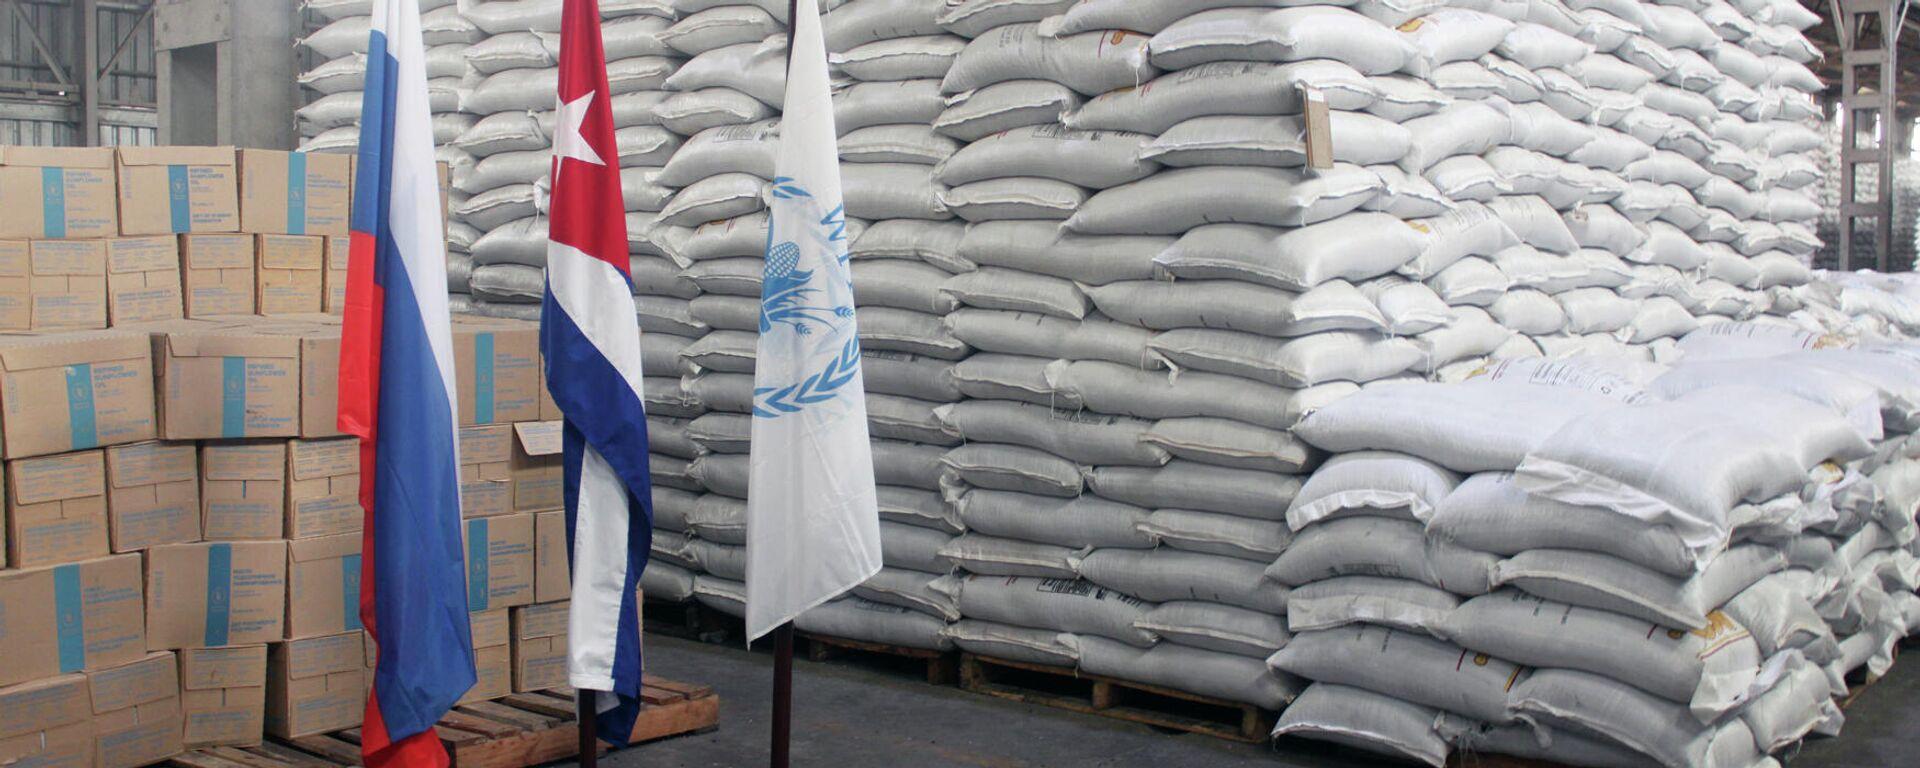 Parte del donativo de Rusia a Cuba a través del Fondo Mundial de Alimentos - Sputnik Mundo, 1920, 23.04.2021